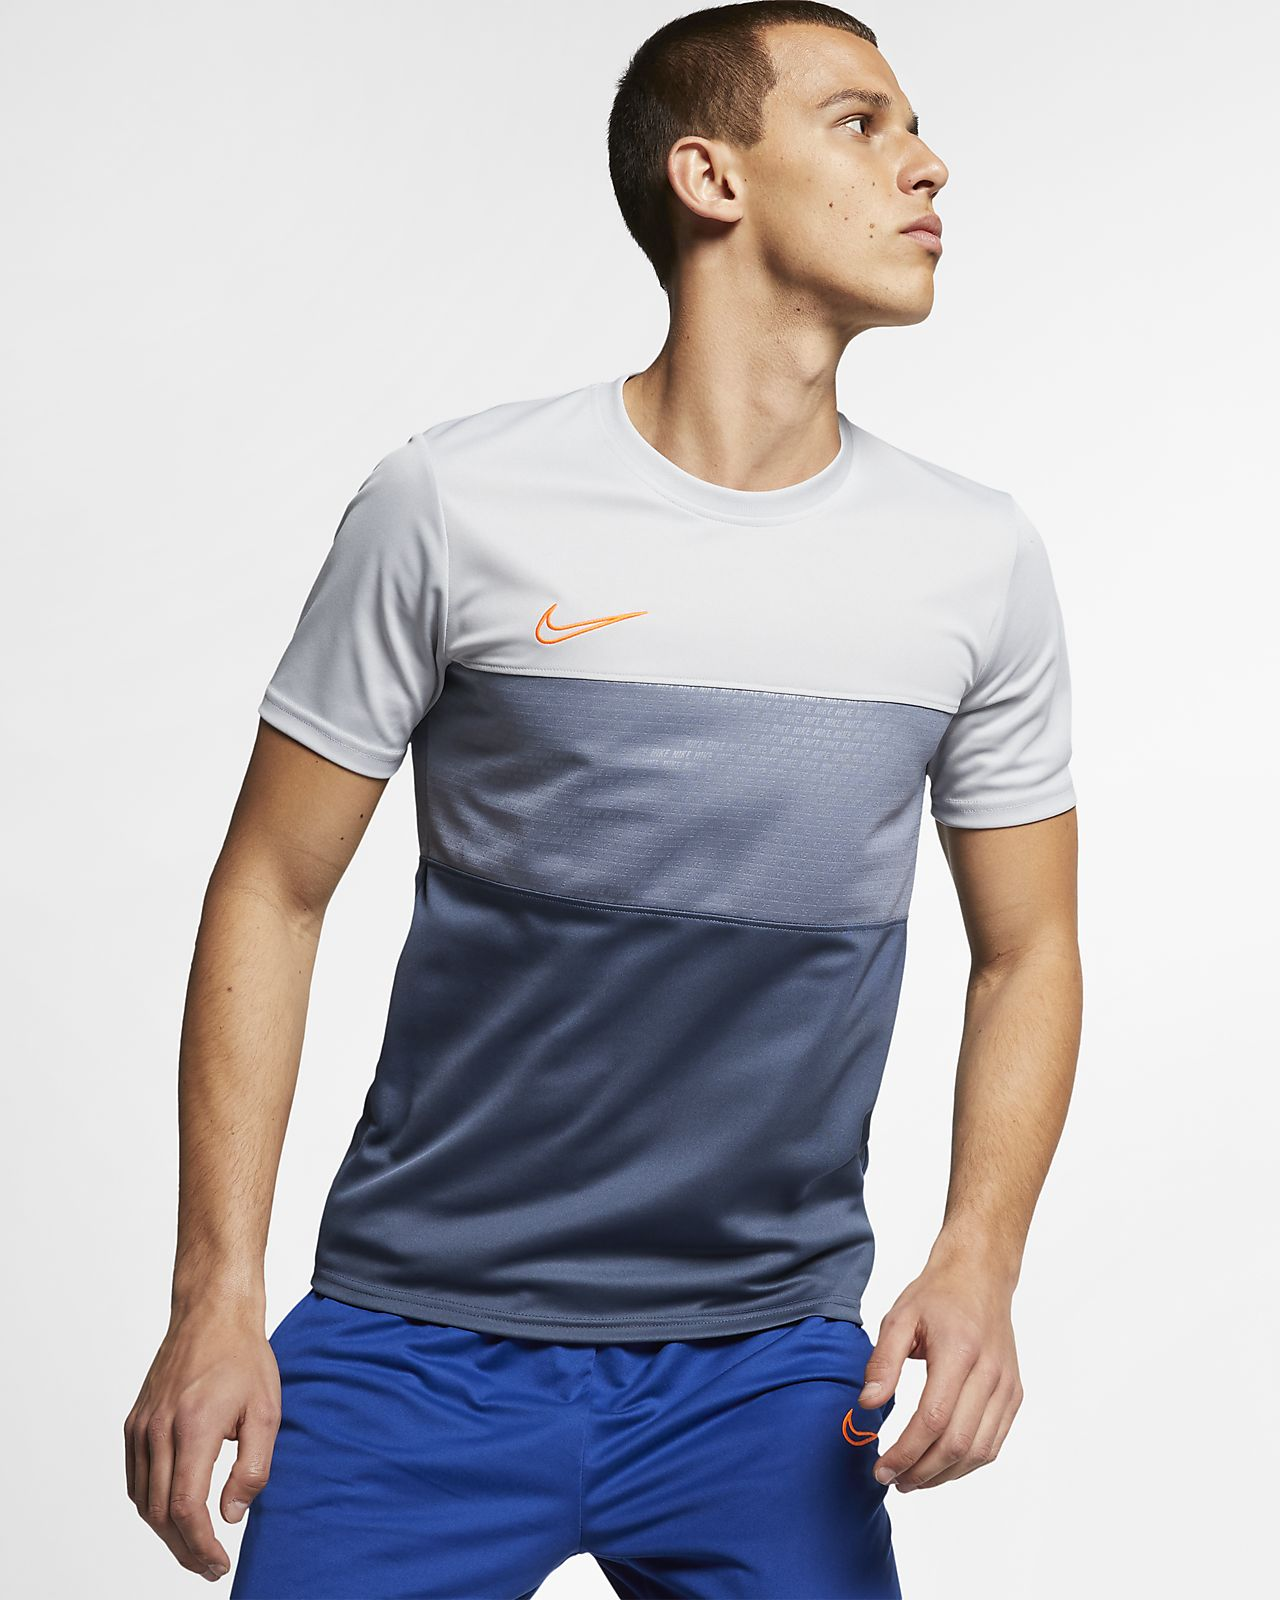 Nike Dri-FIT Academy rövid ujjú férfi futballfelső